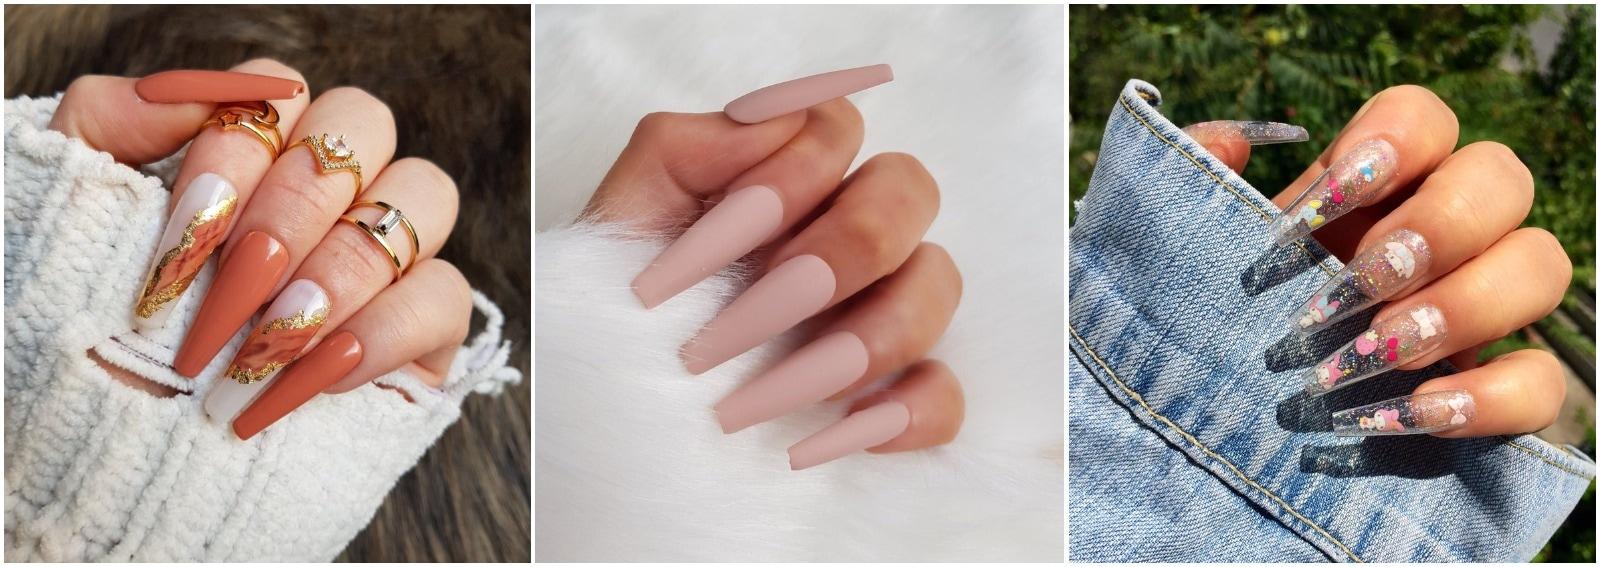 unghie a ballerina nails coffin manicure cover desktop